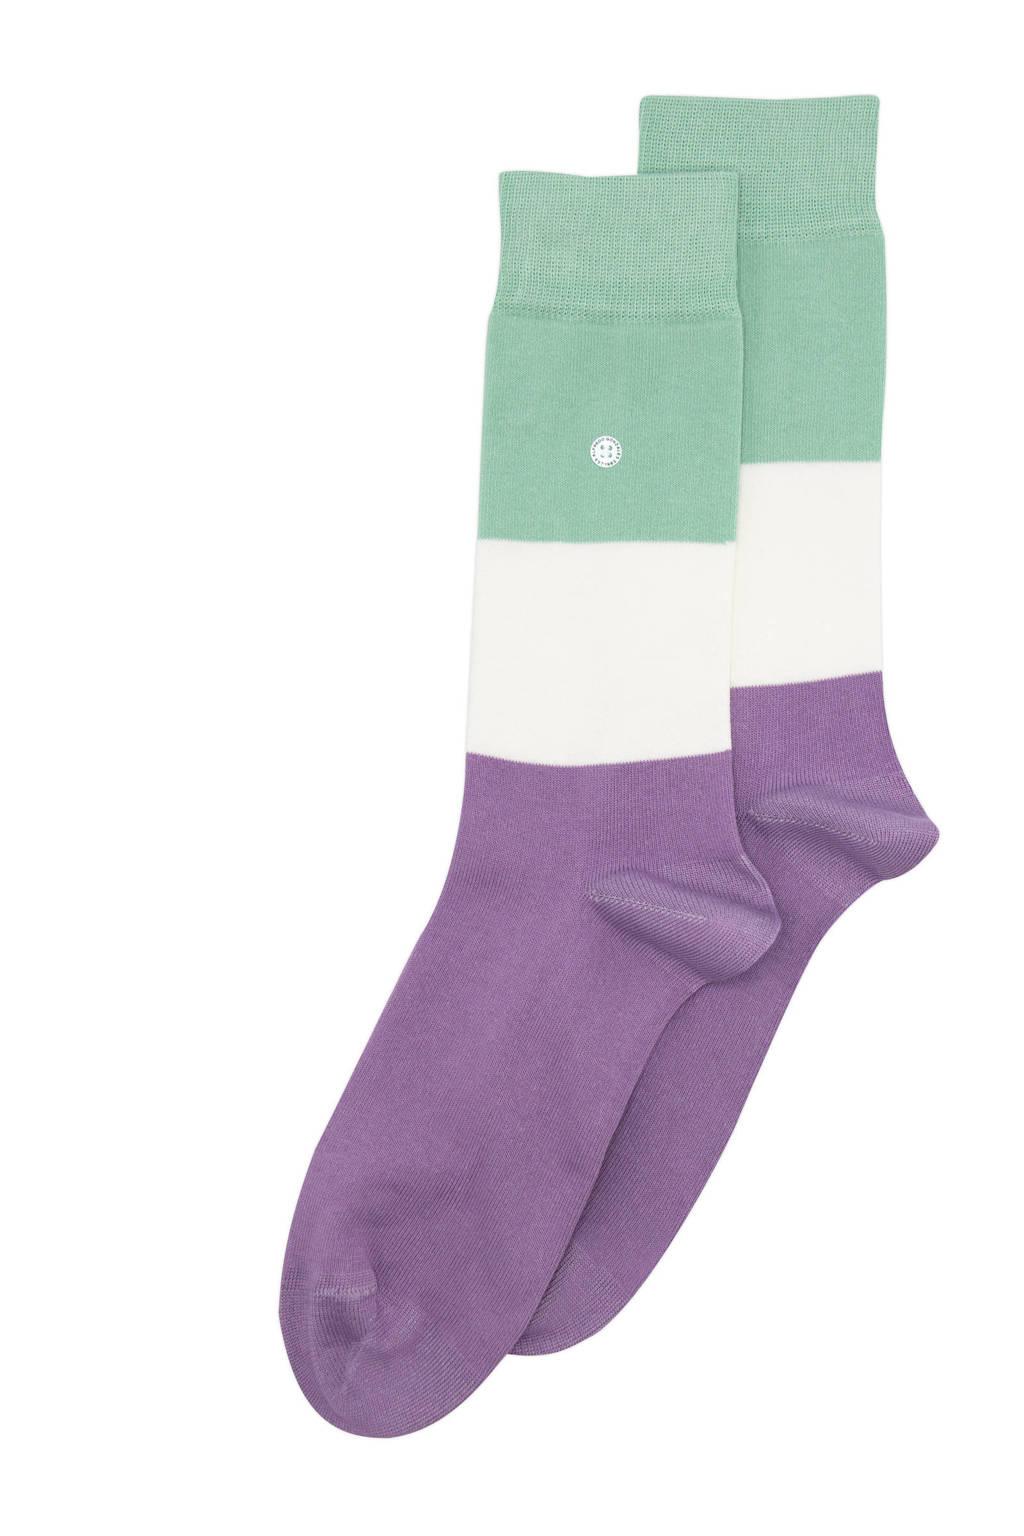 Alfredo Gonzales sokken Big Stripes lila/ecru/mintgroen, Lila/ecru/mintgroen